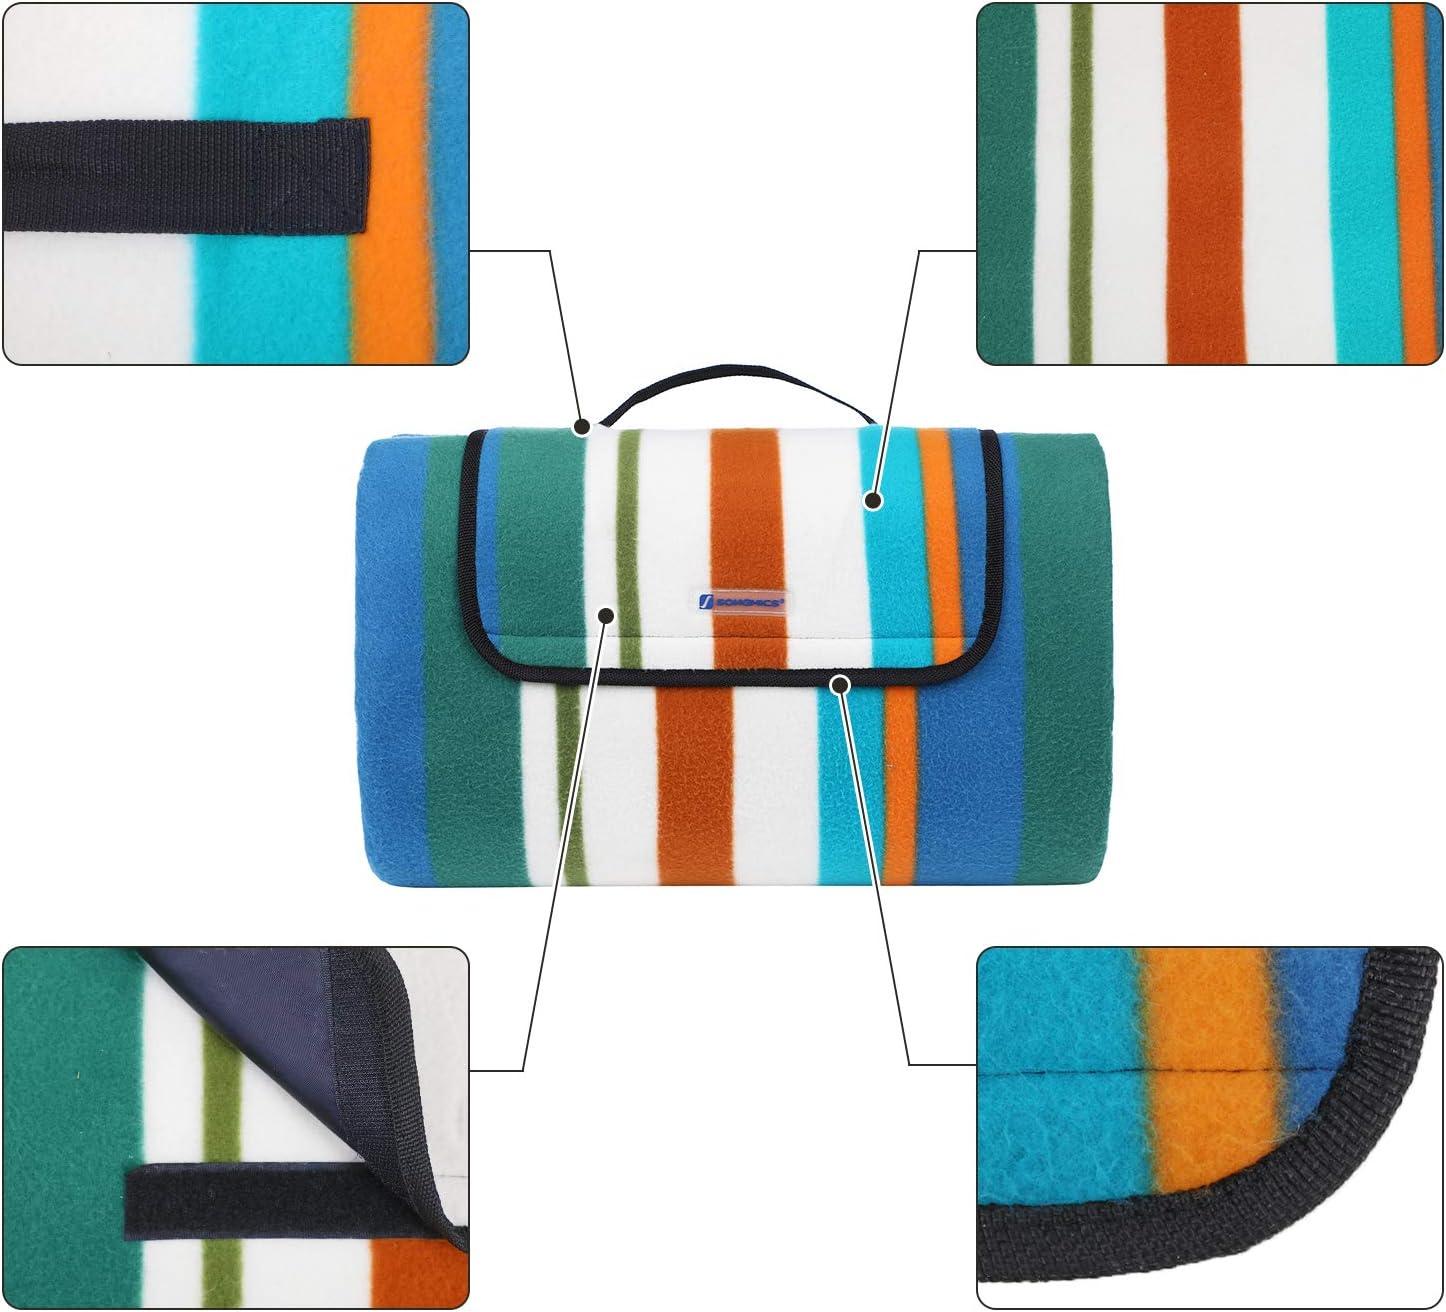 SONGMICS 200 x 200 cm Manta de Picnic Impermeable Alfombra Acolchada para Jard/ín Camping Playa Multiusos Port/átil GCM74J